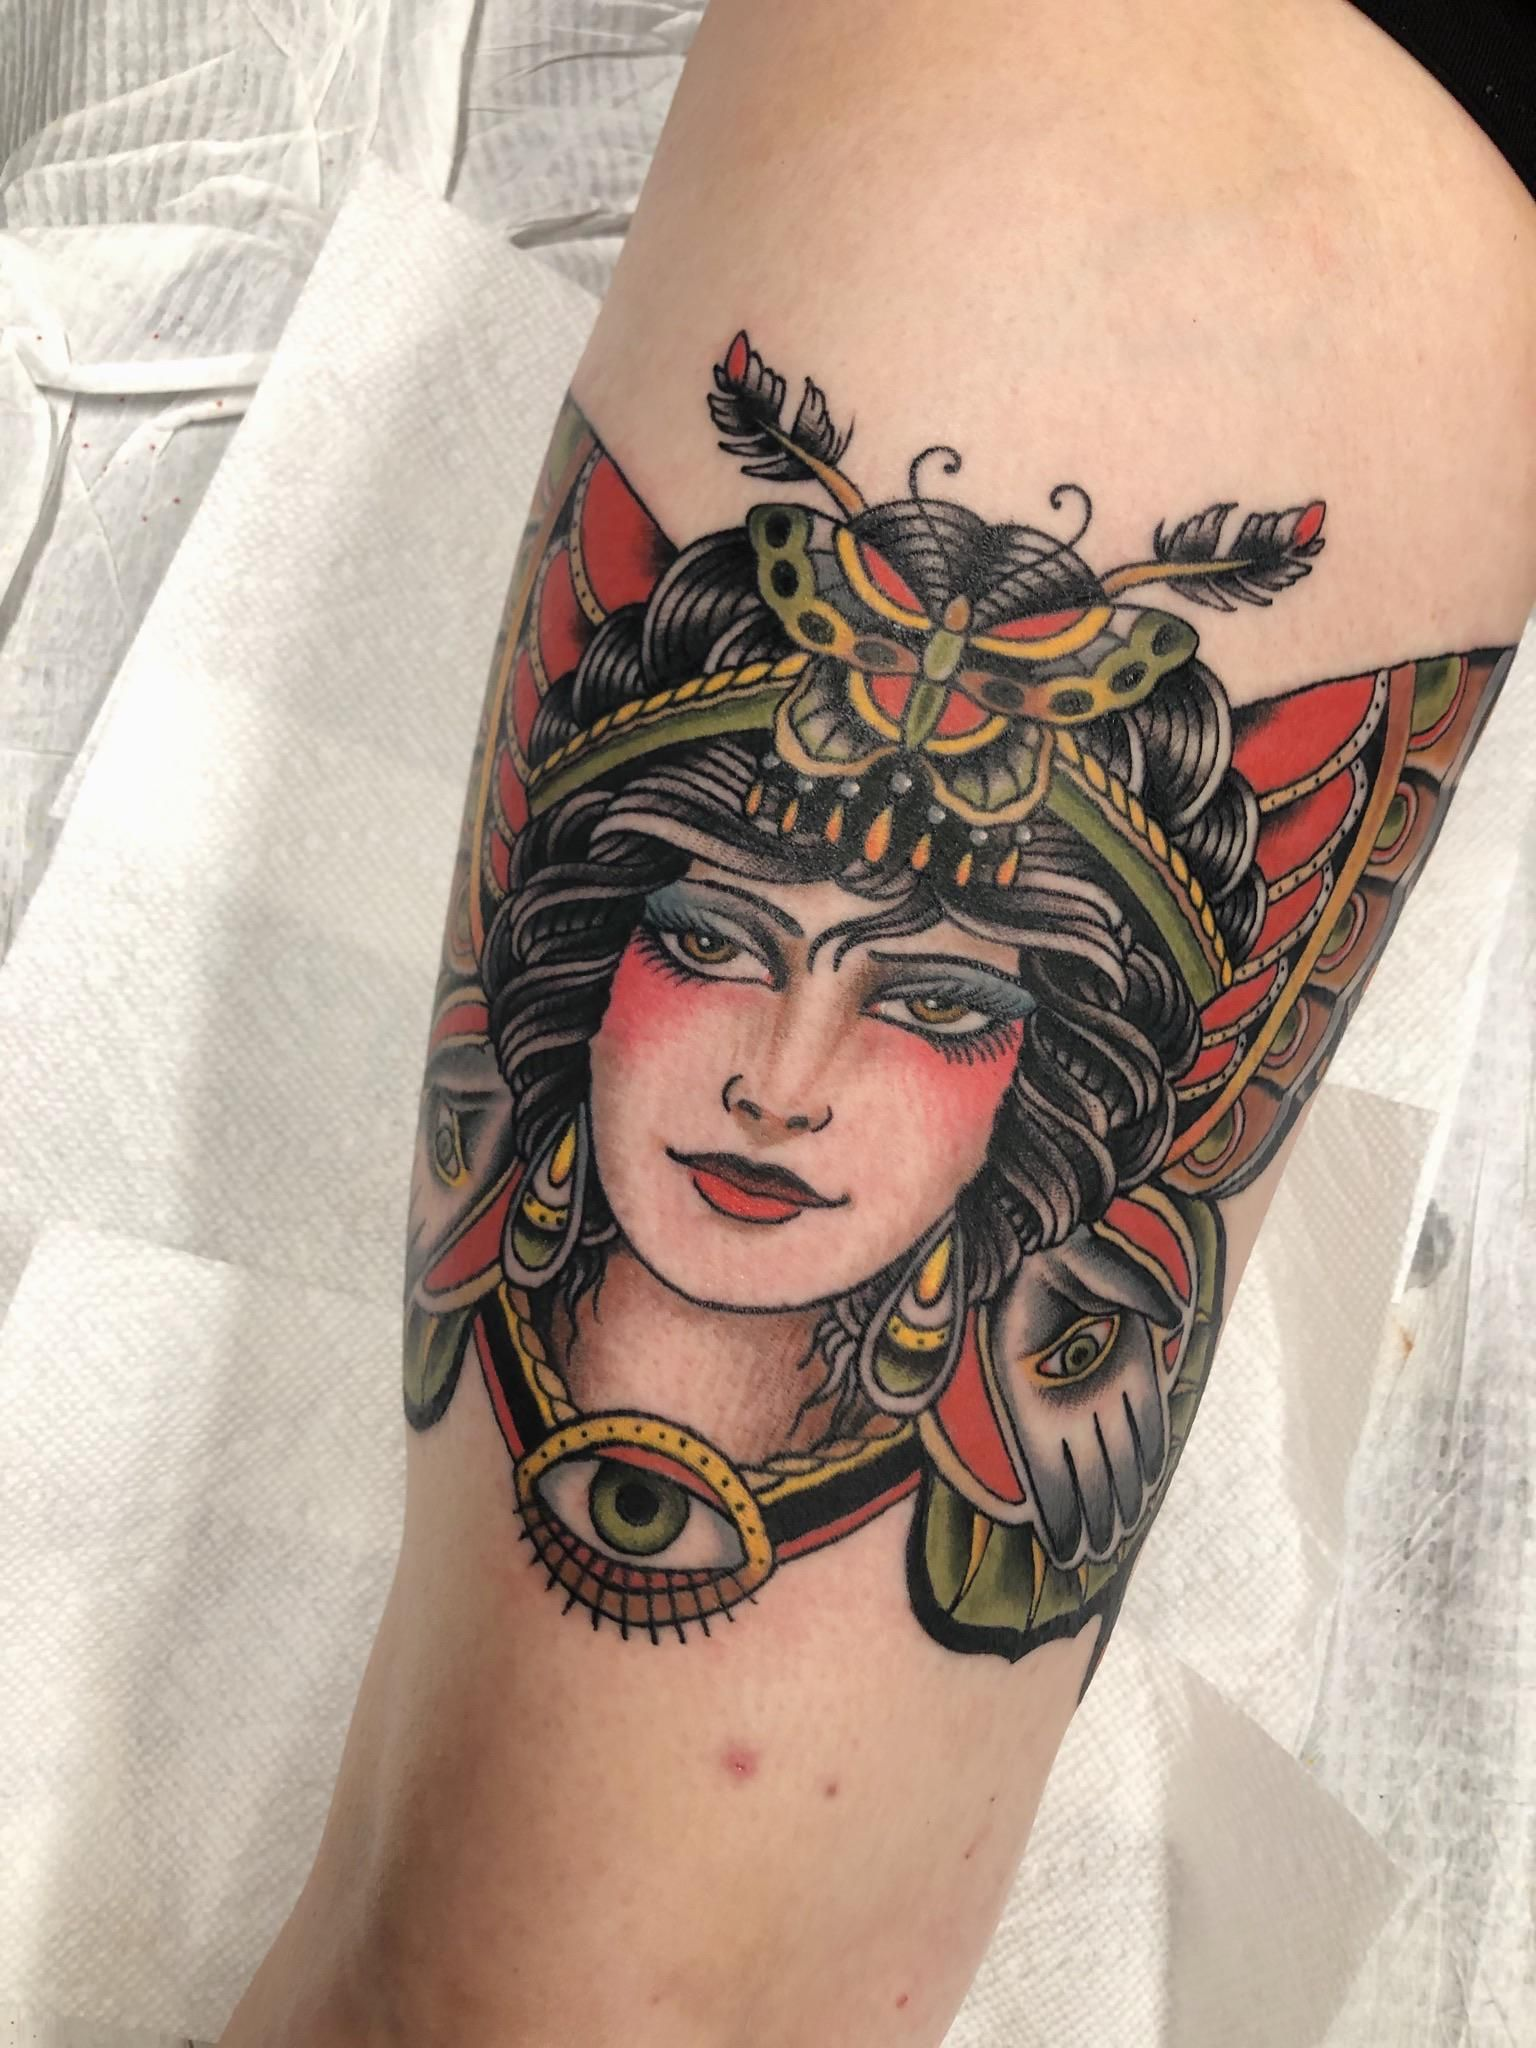 Paul Dobleman Style By John Setzer In Richmondva At Yellowbird Tattoo In 2020 Tattoos R Tattoo Tattoo Photos